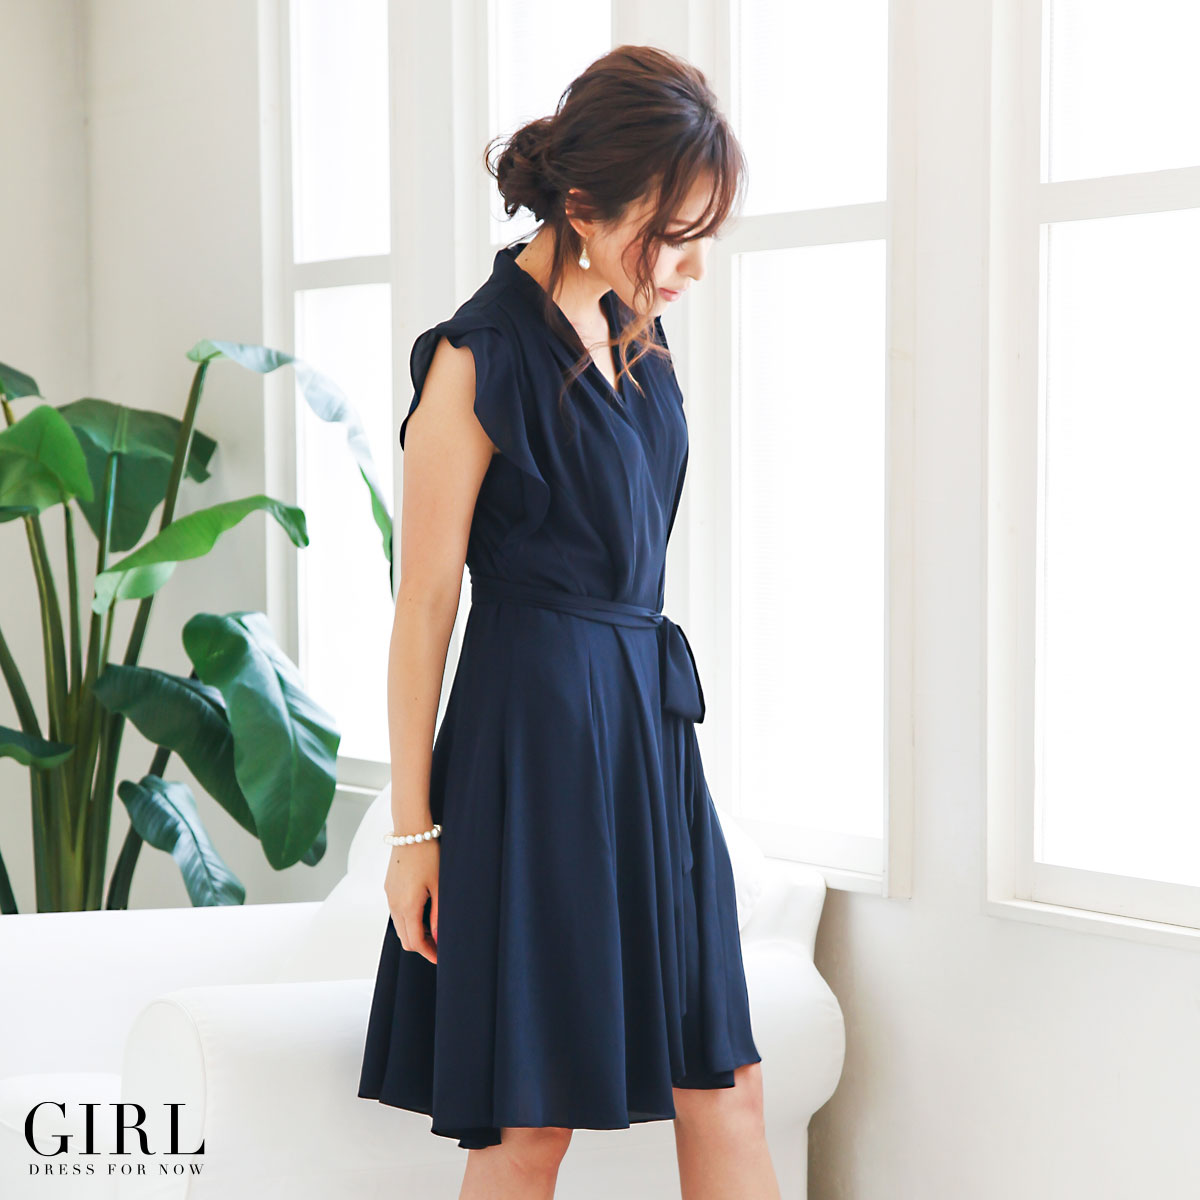 Dress Shop GIRL: Size Invite, Etc. That A Dress Wedding